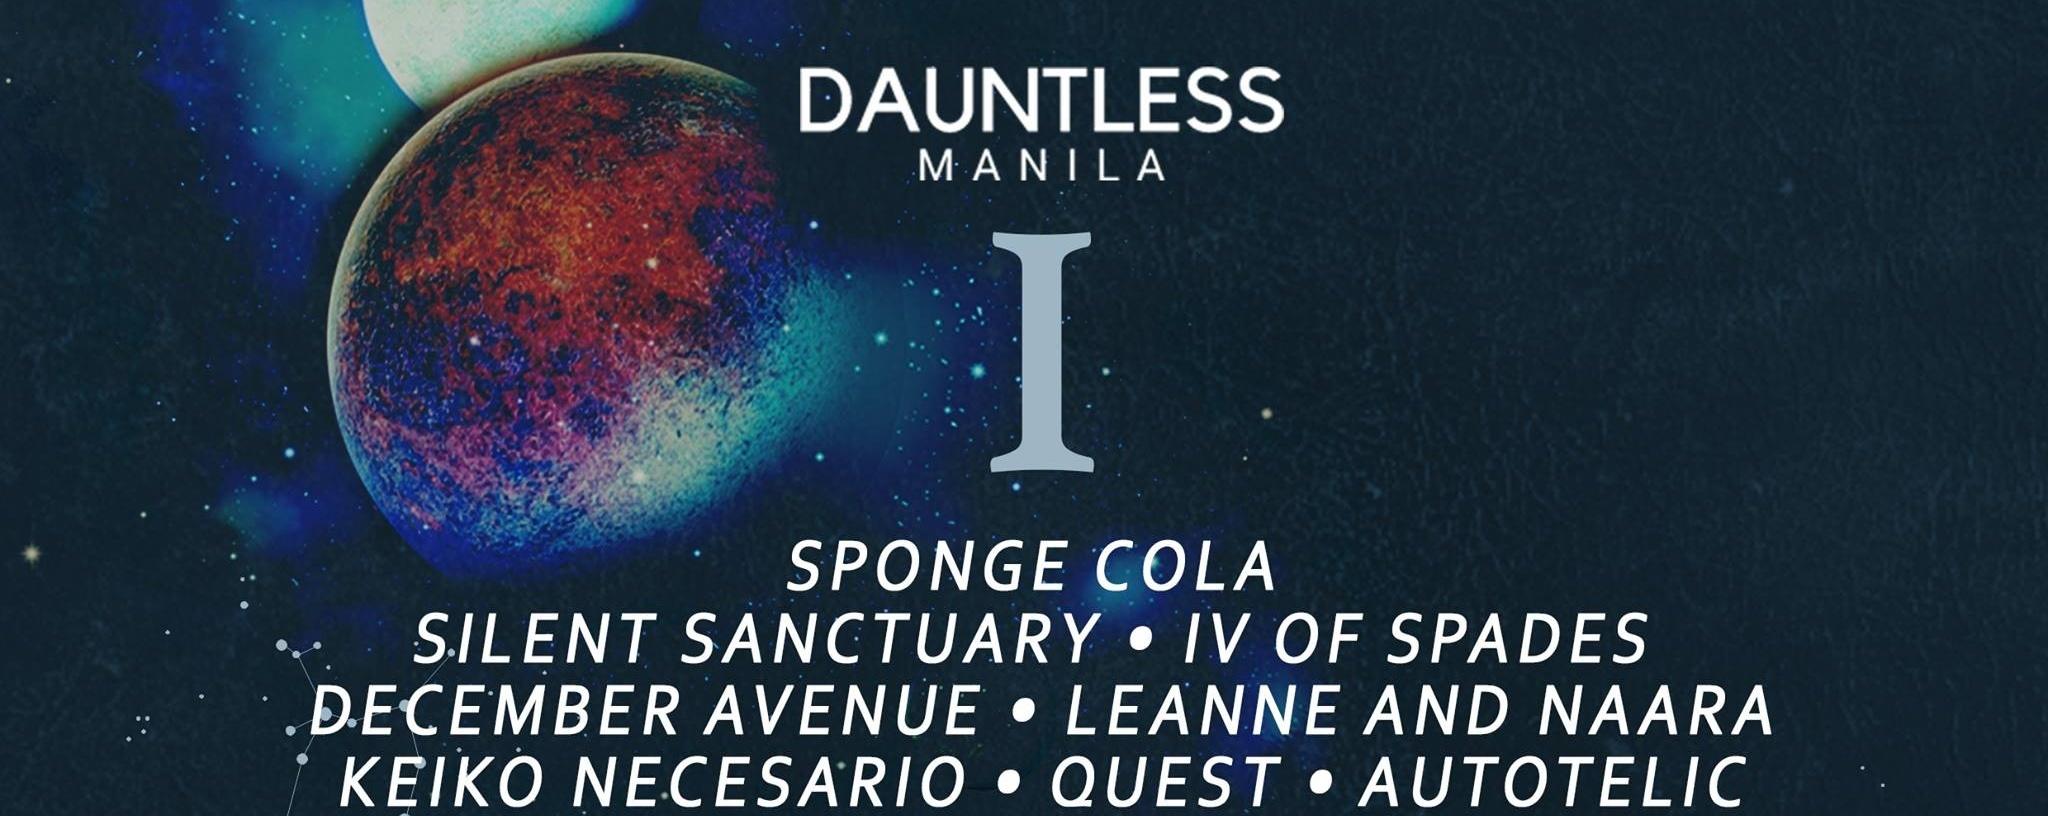 Dauntless Manila: I